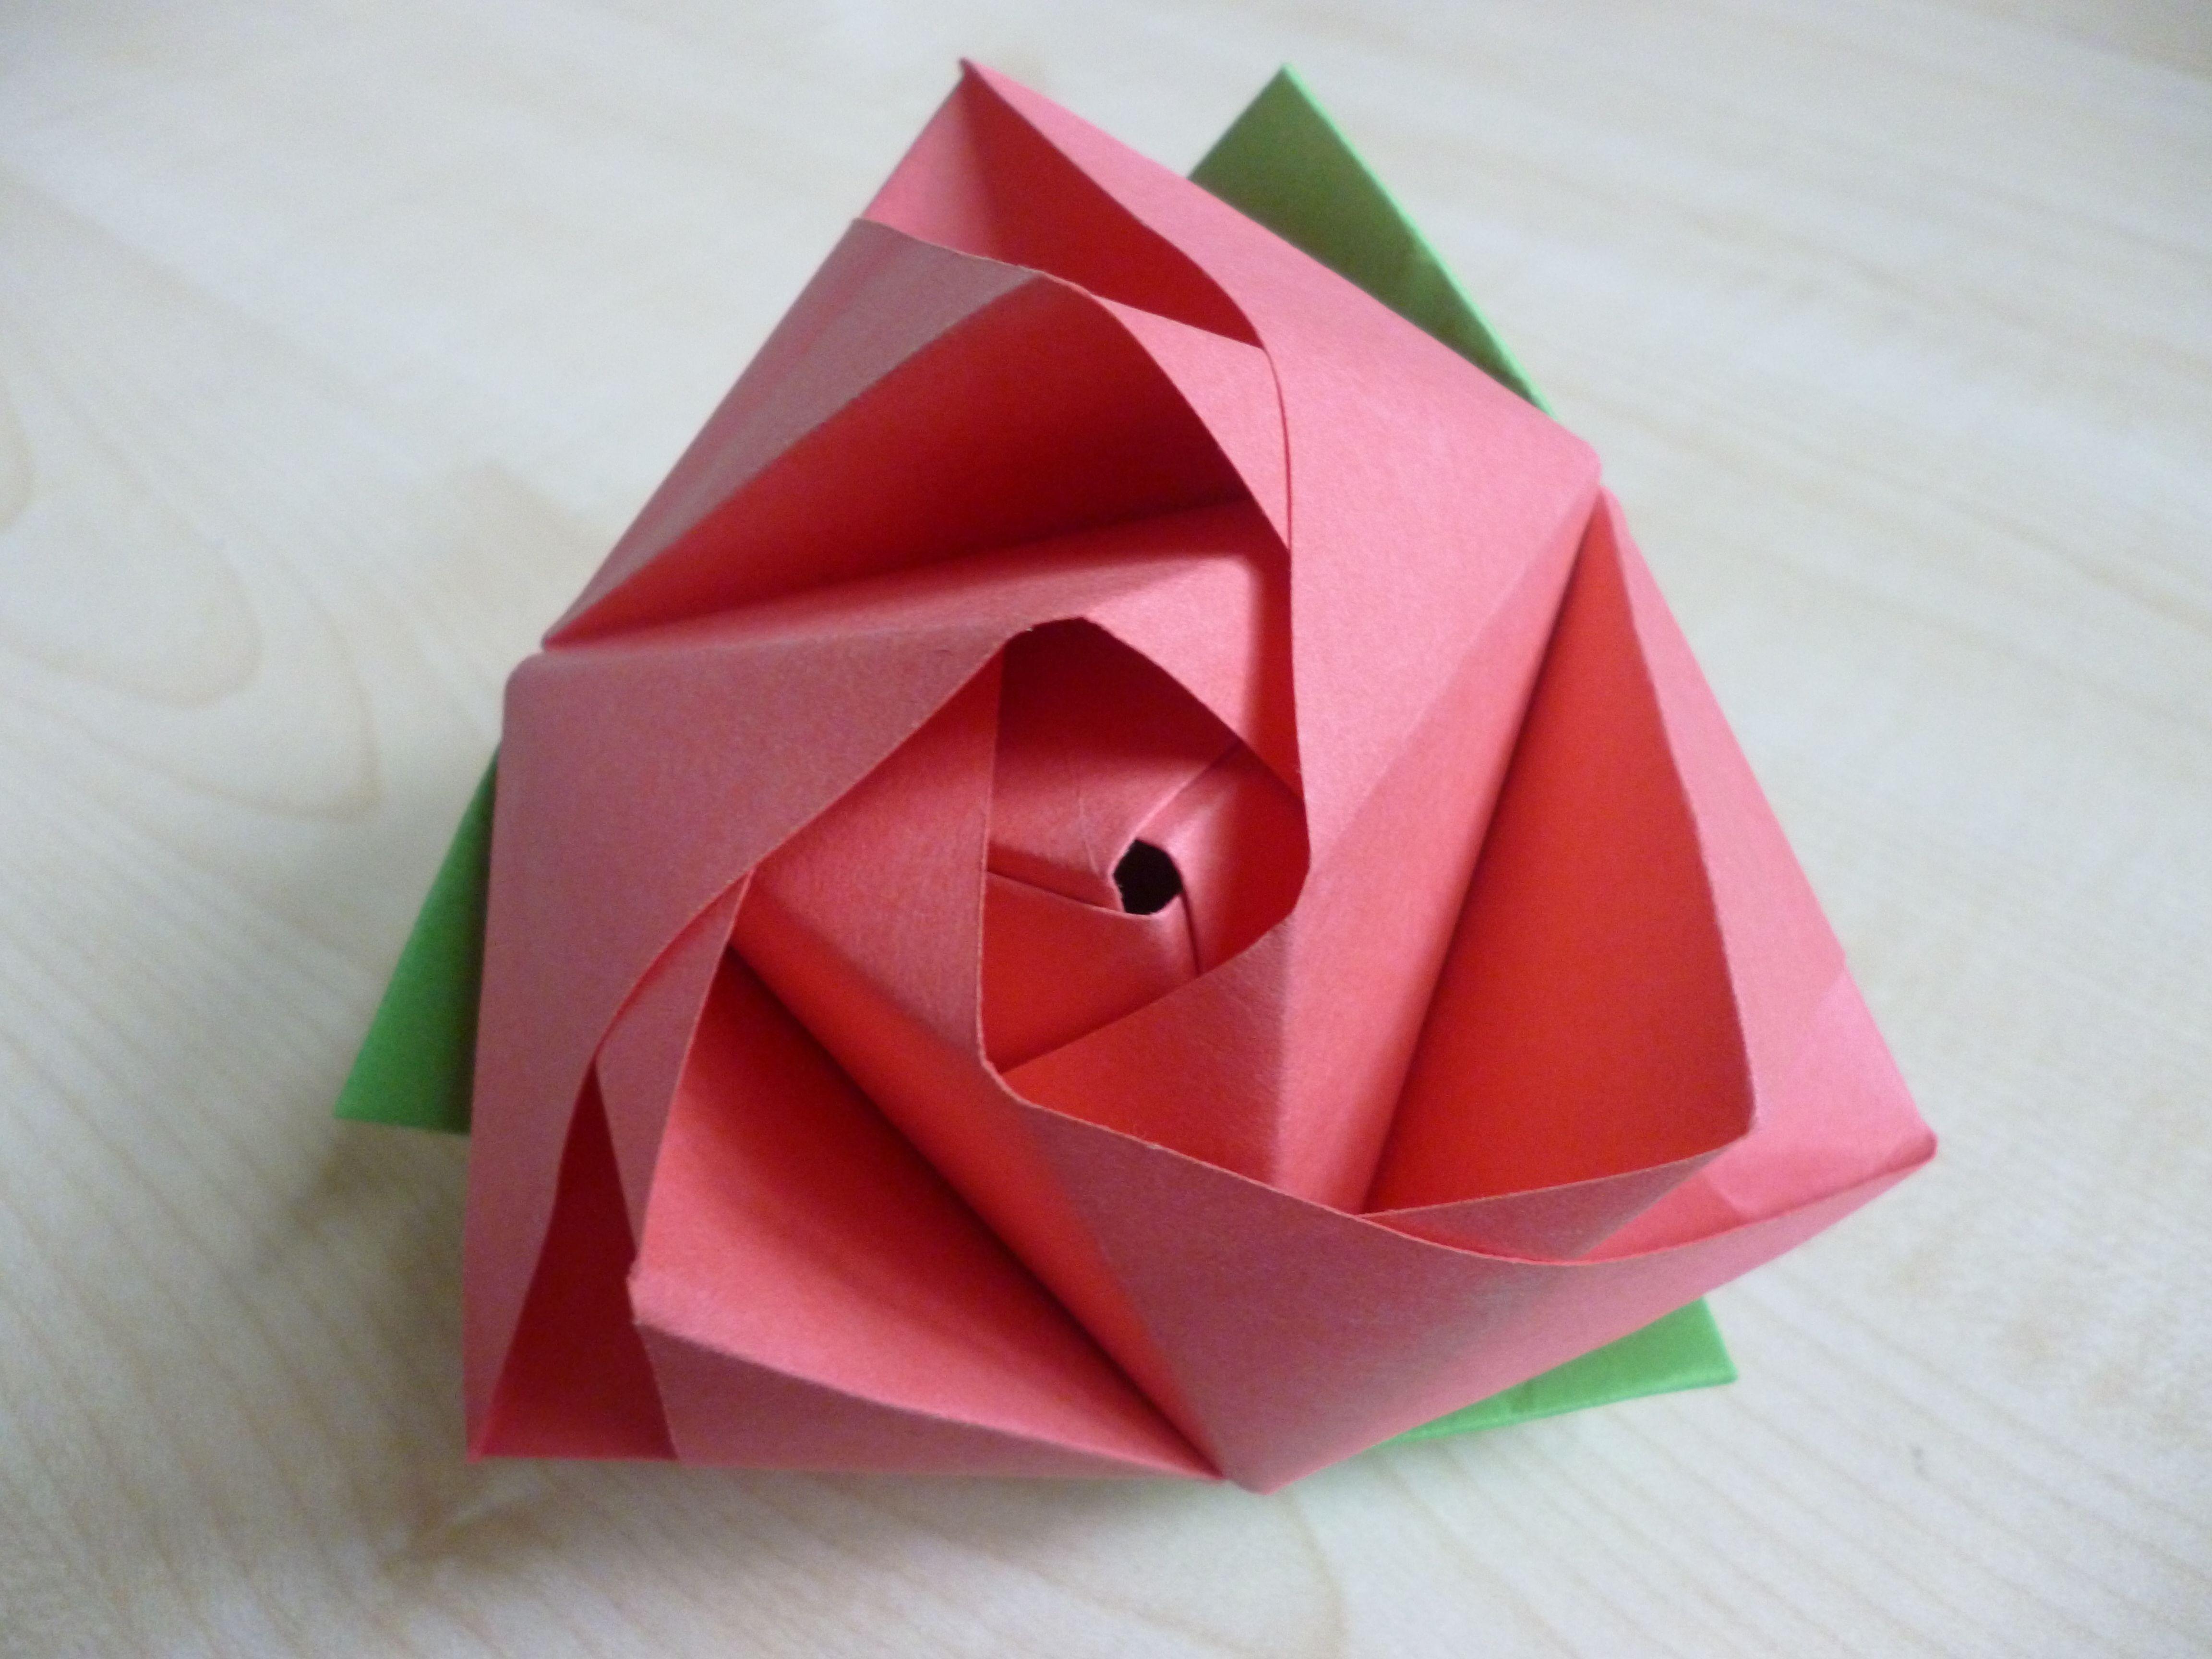 Magic Rose Cube - DIY Modular Origami Tutorial by Paper Folds ... | 3456x4608